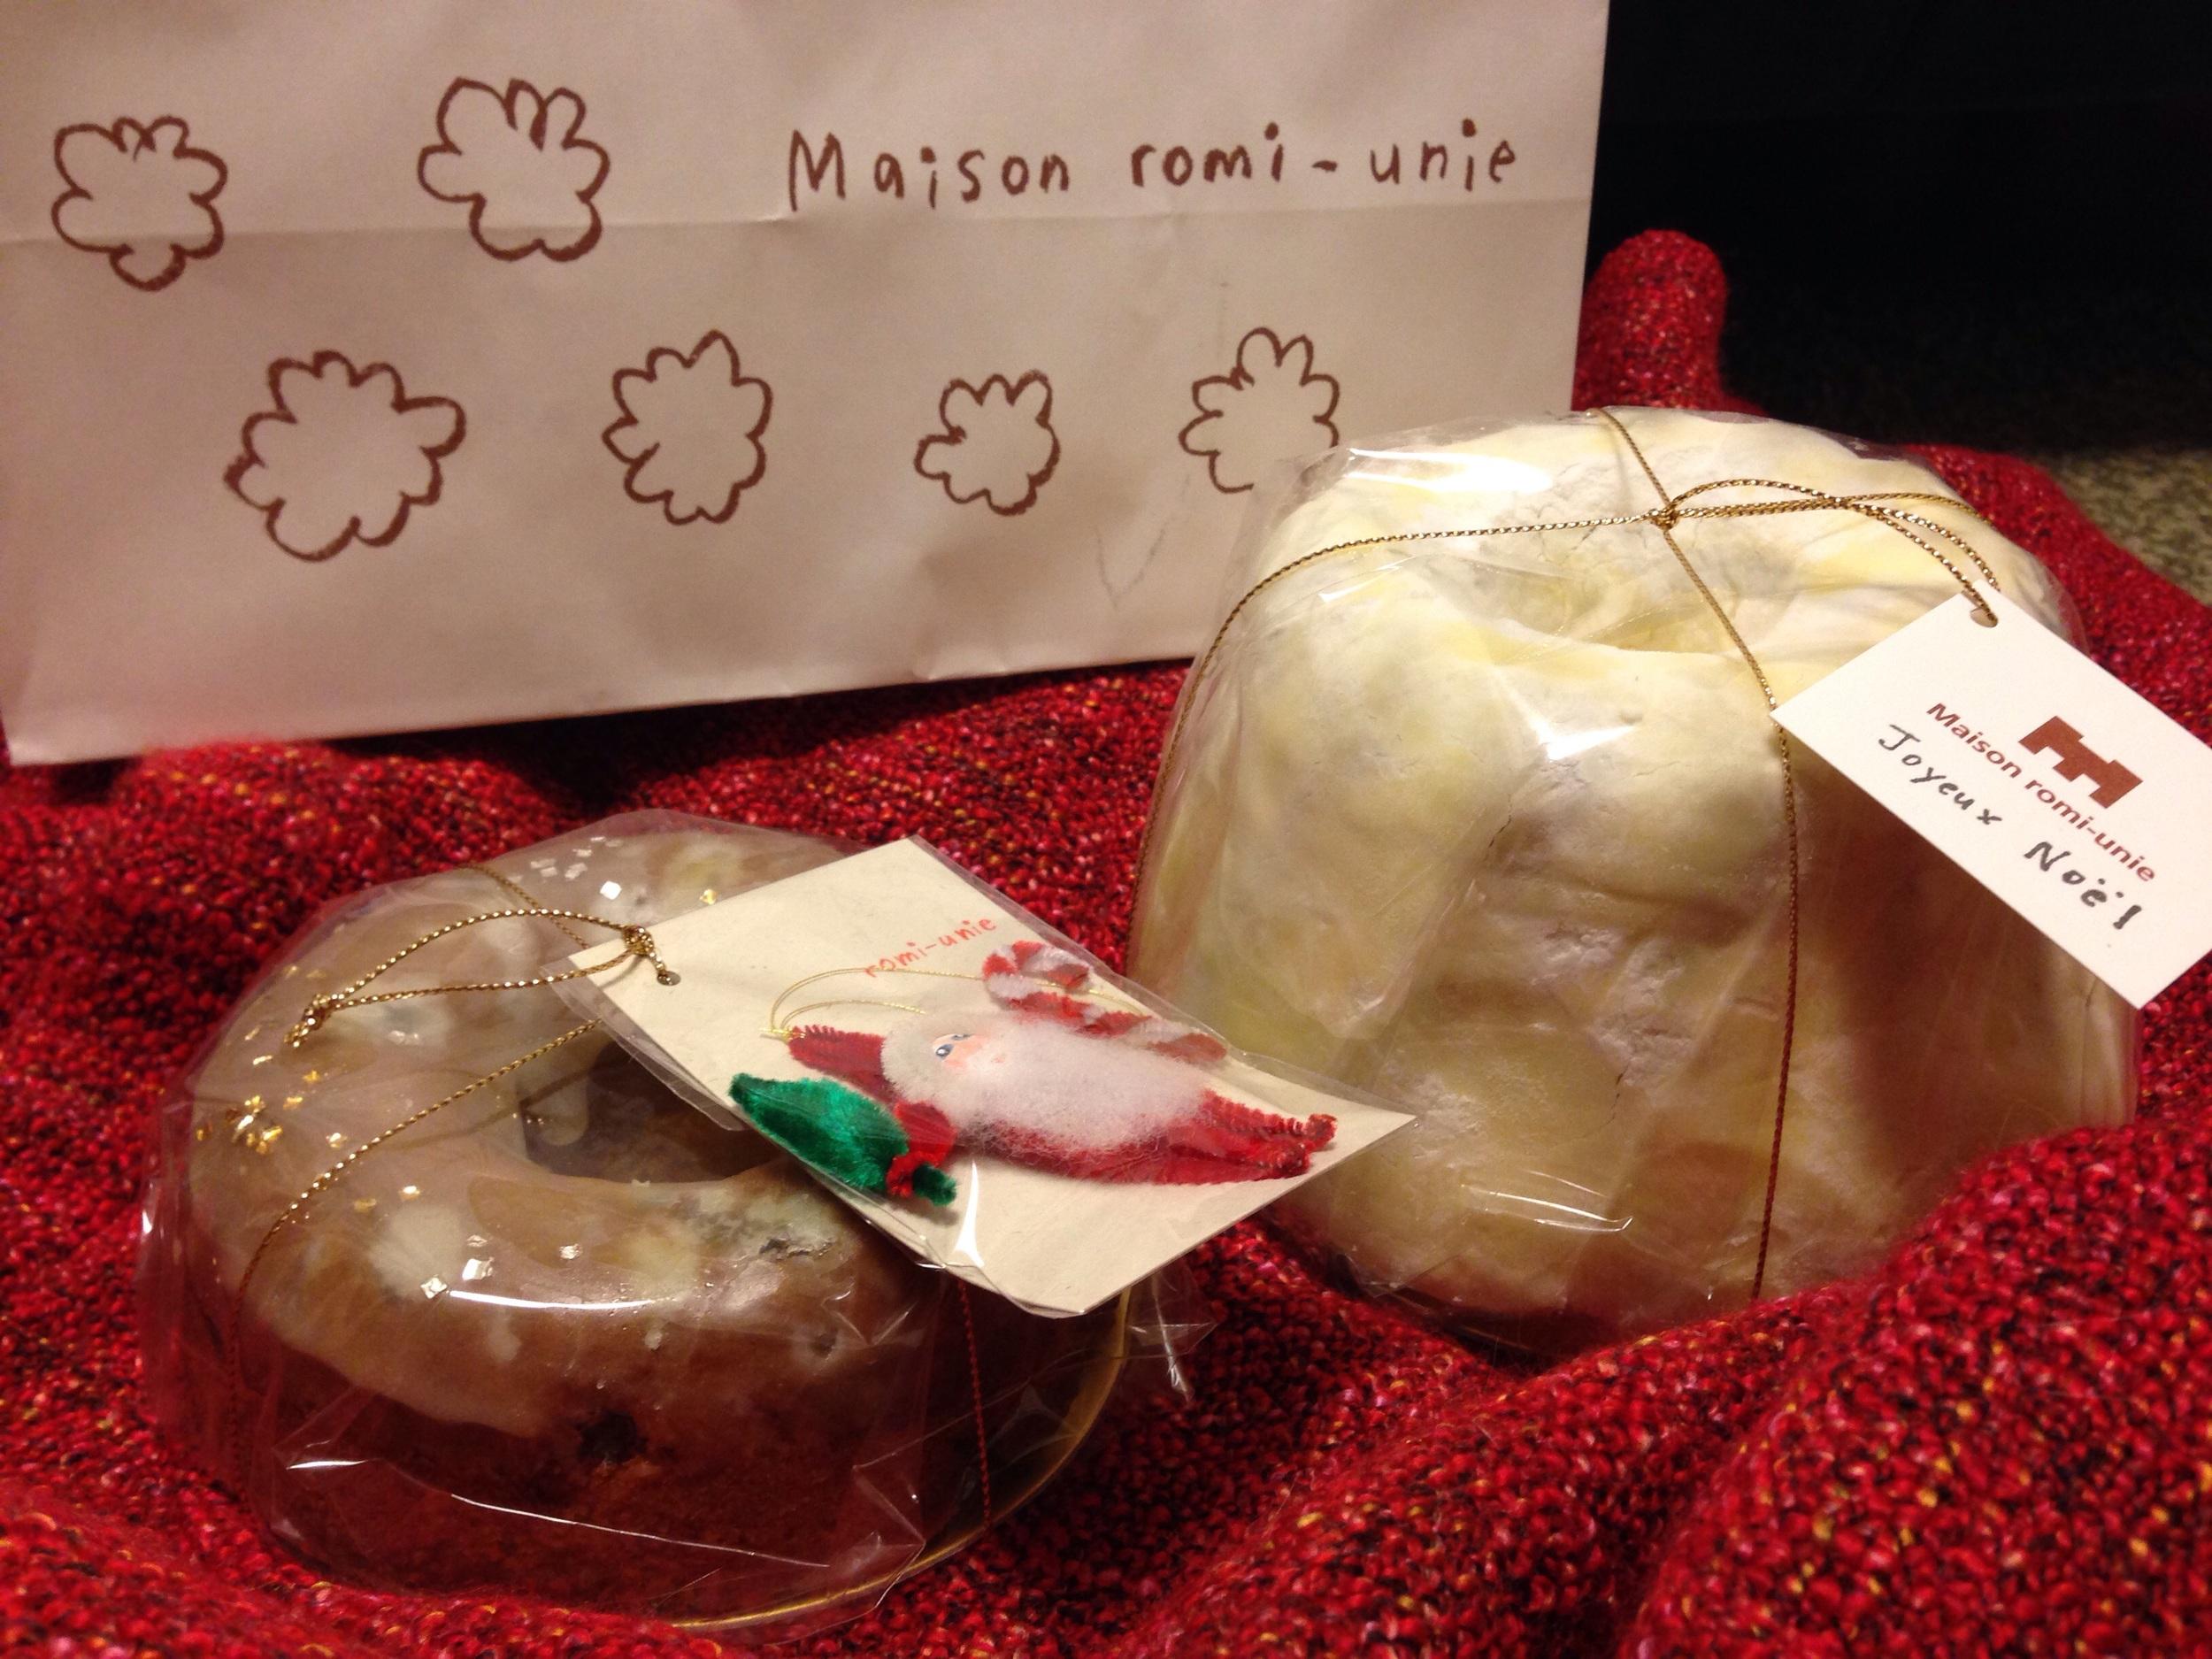 Luscious christmas cake and stollen from  Maison Romi-unie in Gakugei-Daigaku, Tokyo